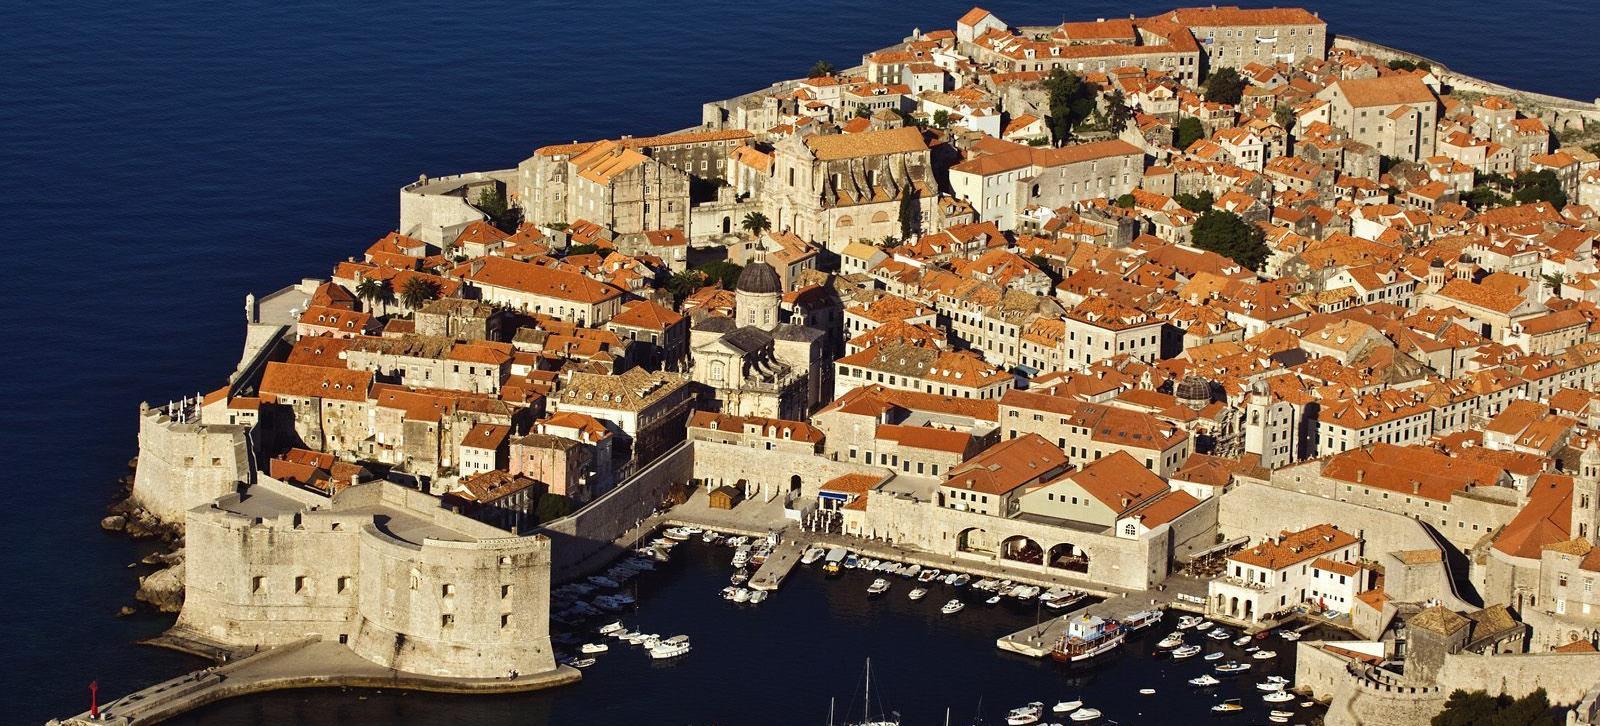 Big dubrovnik southern coast of croatia adriatic sea